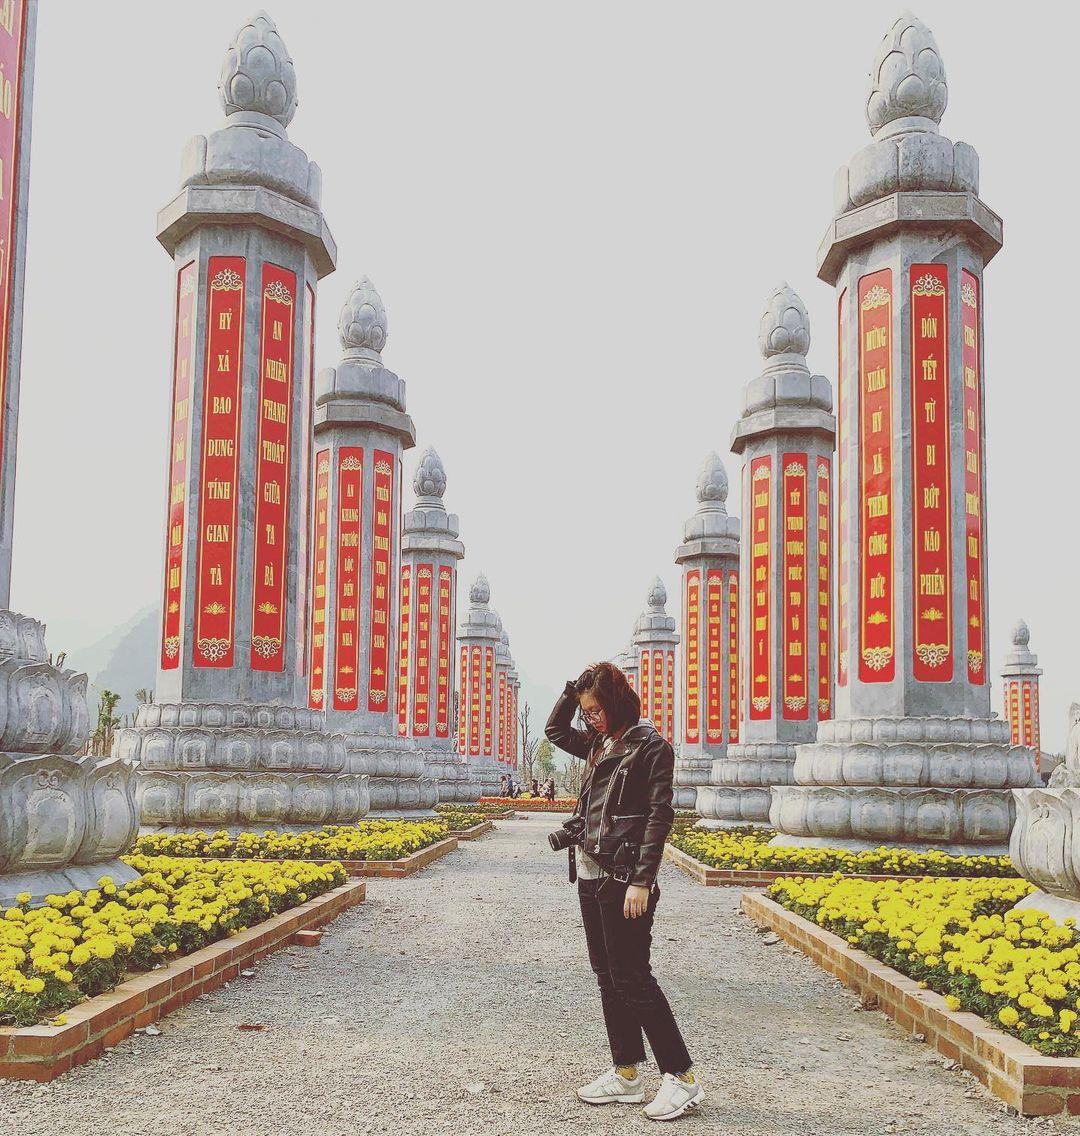 tam chuc pagoda yard